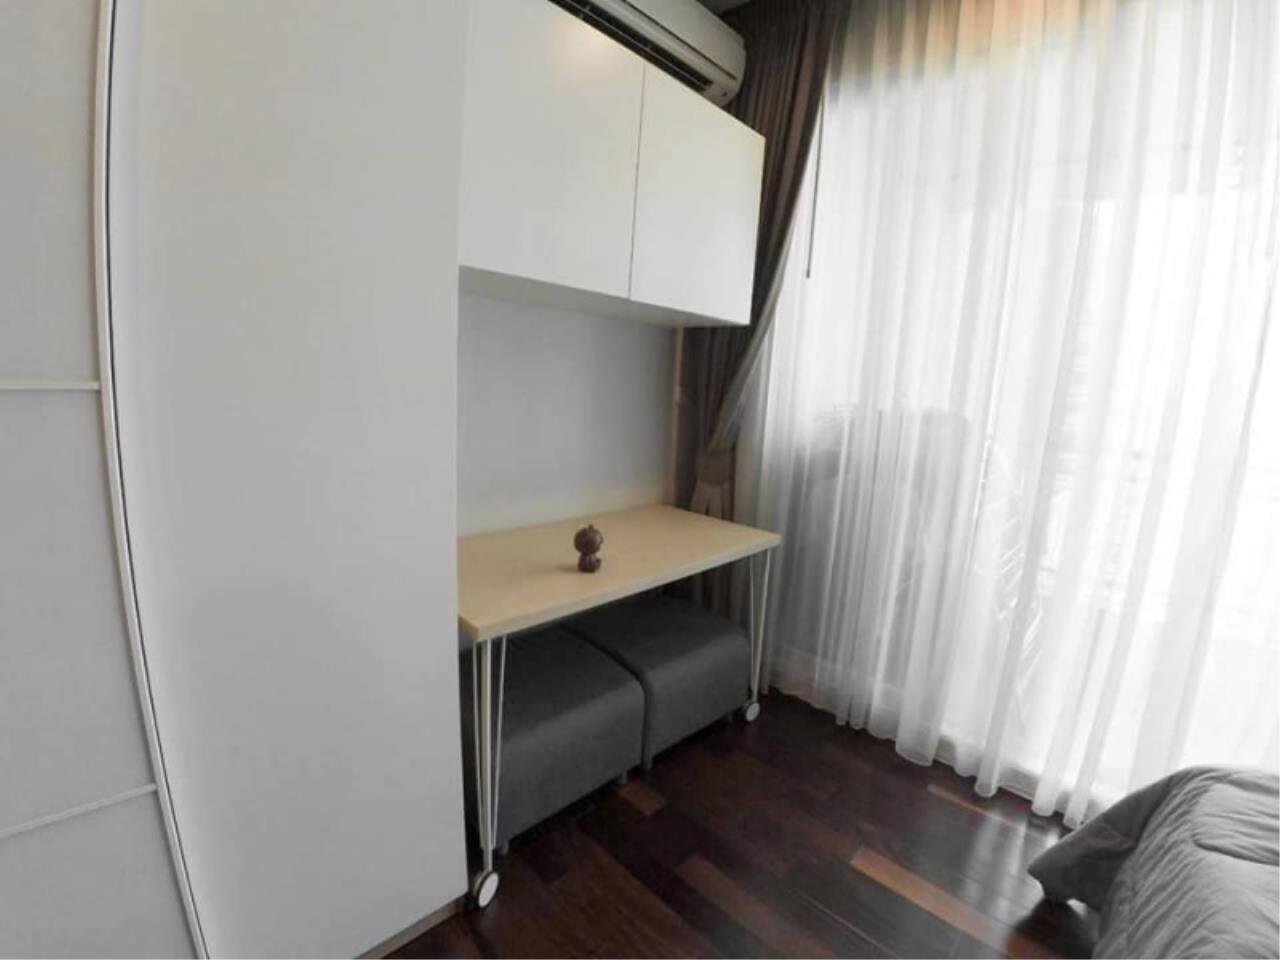 Century21 Skylux Agency's Circle Condominium / Condo For Sale / 1 Bedroom / 33.51 SQM / MRT Phetchaburi / Bangkok 6